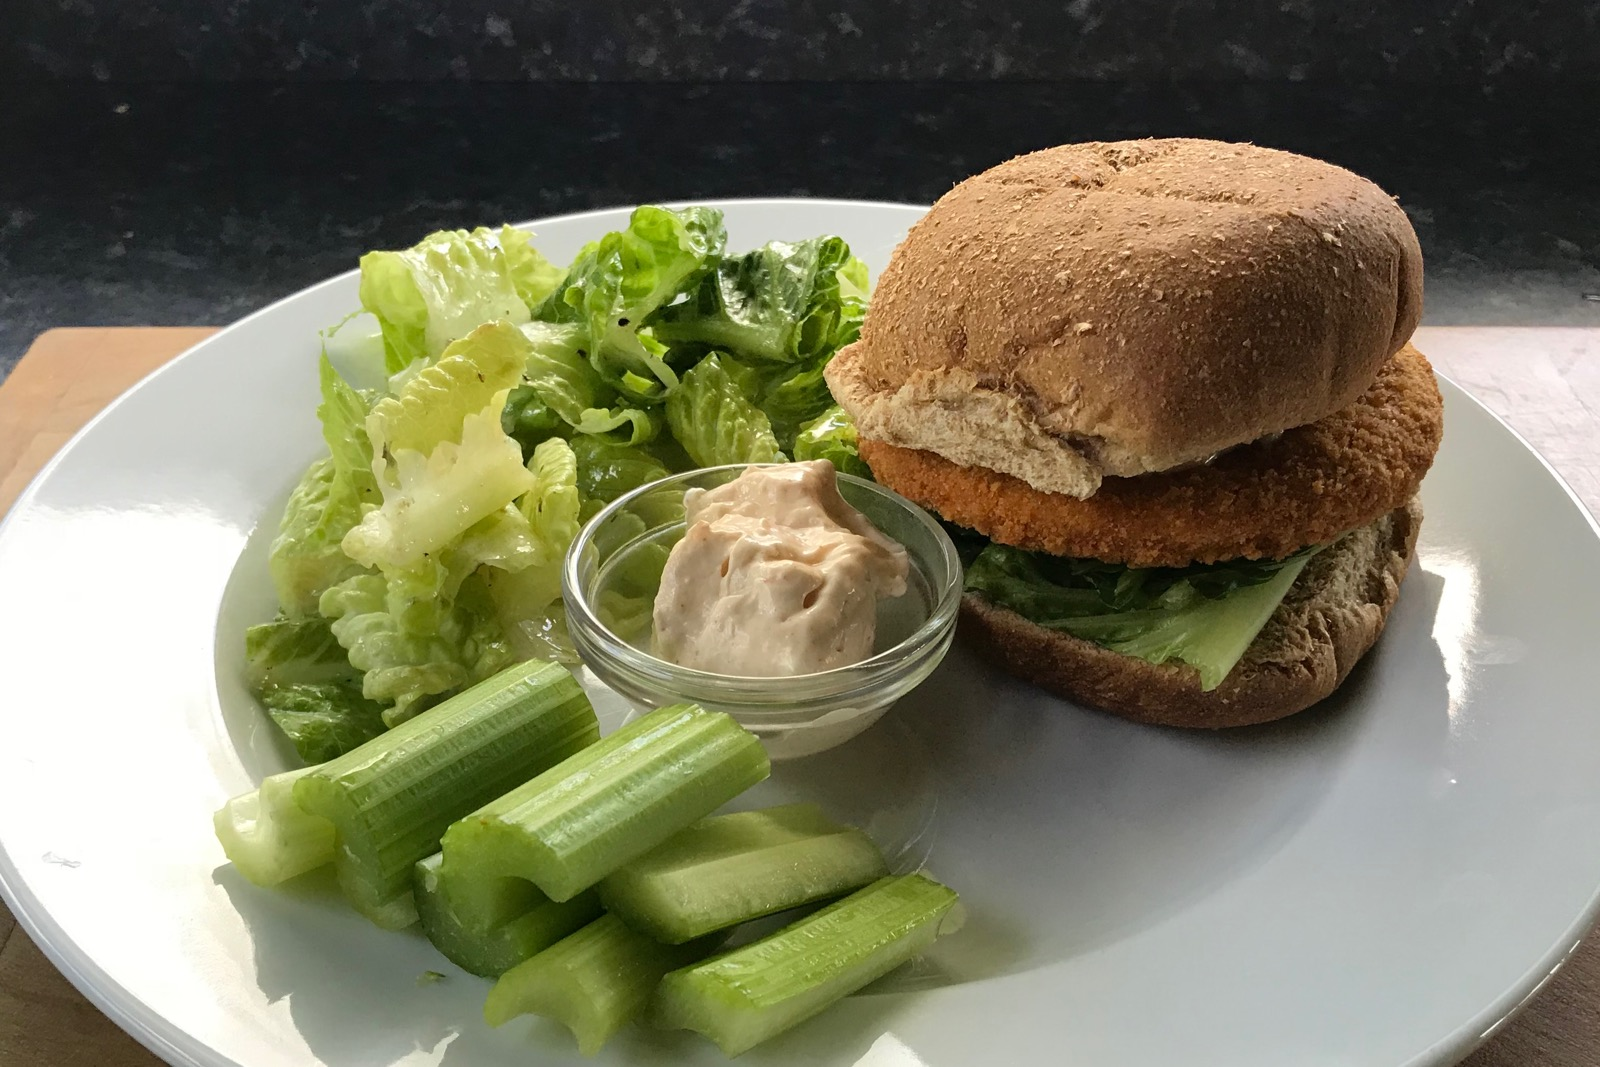 http://blog.rickk.com/food/2018/10/06/ate.2018.10.05.l.jpg